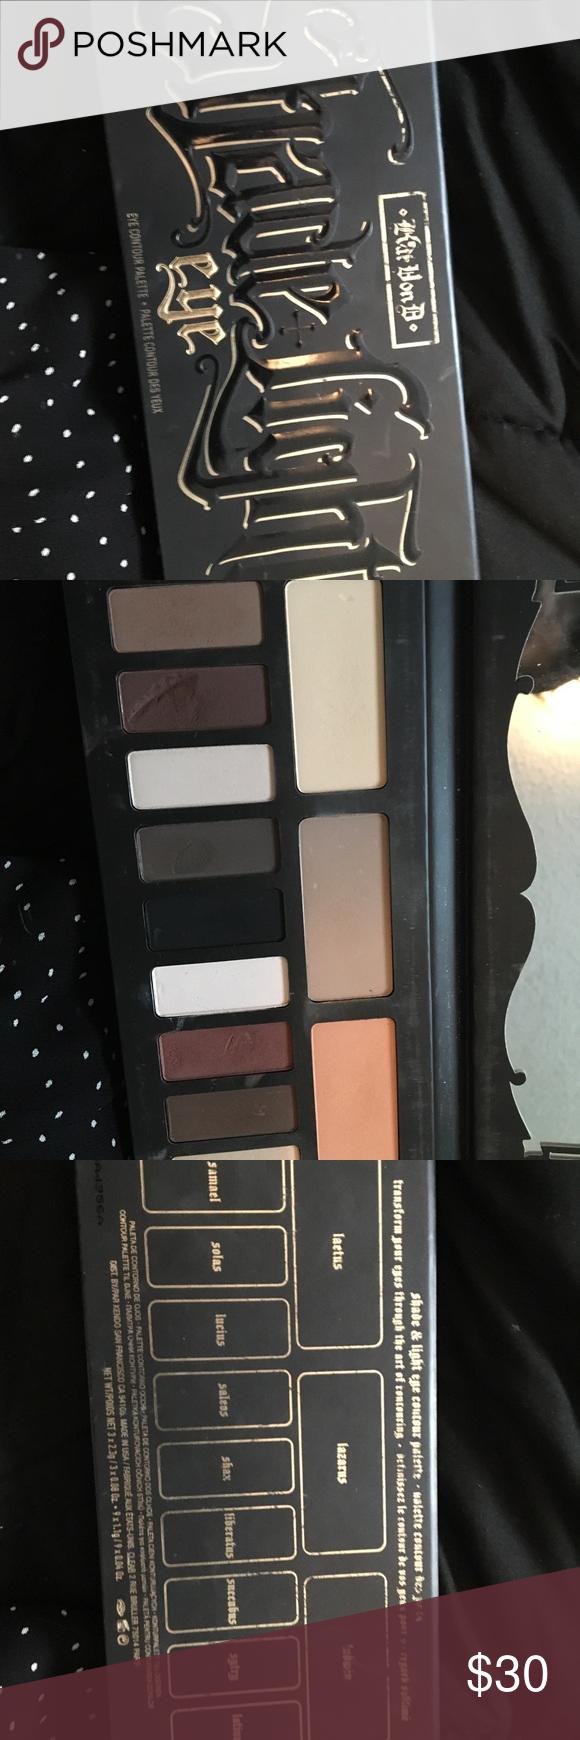 Shade and light KVD palette Kat von d makeup, Kat von d